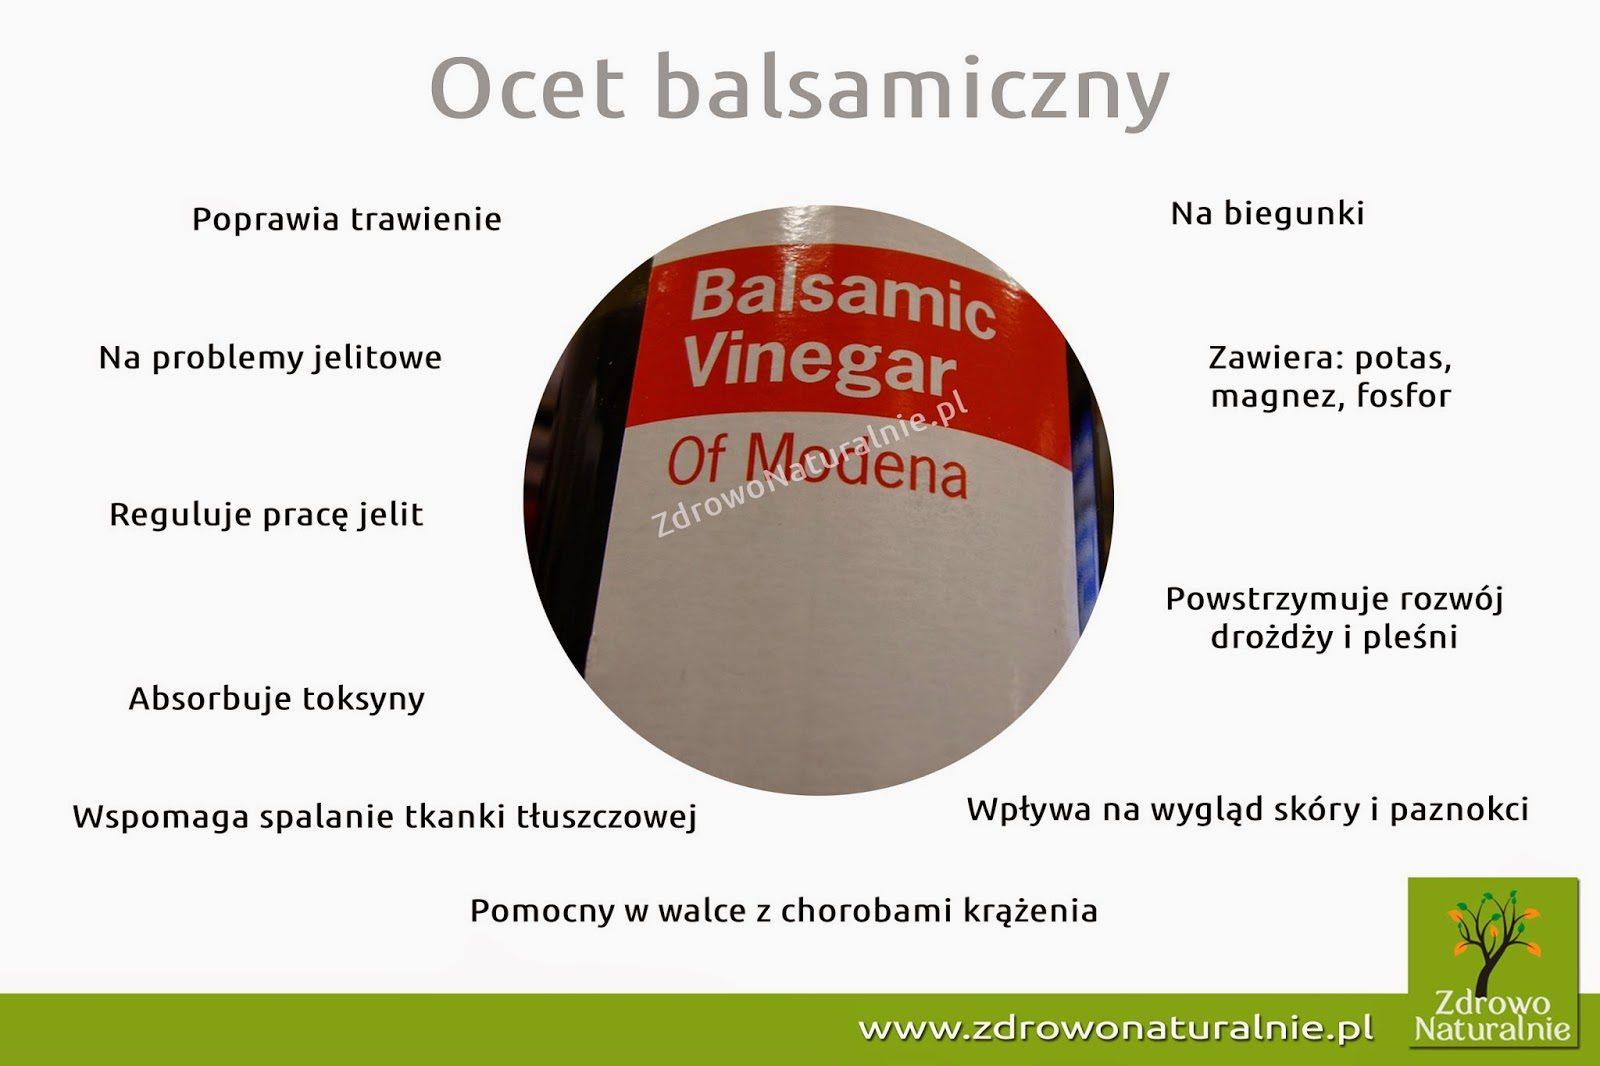 ocet2bbalsamiczny-4028696